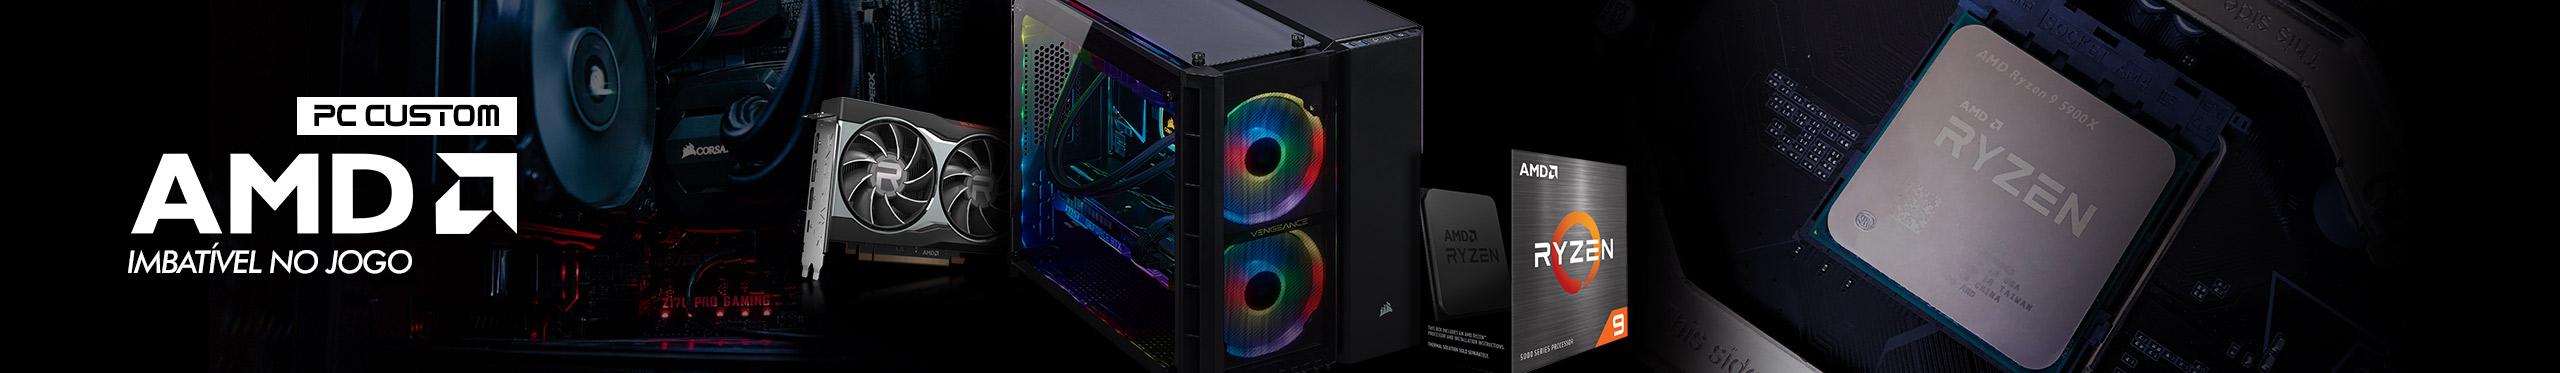 AMD - Imbatível no jogo - Acesse!